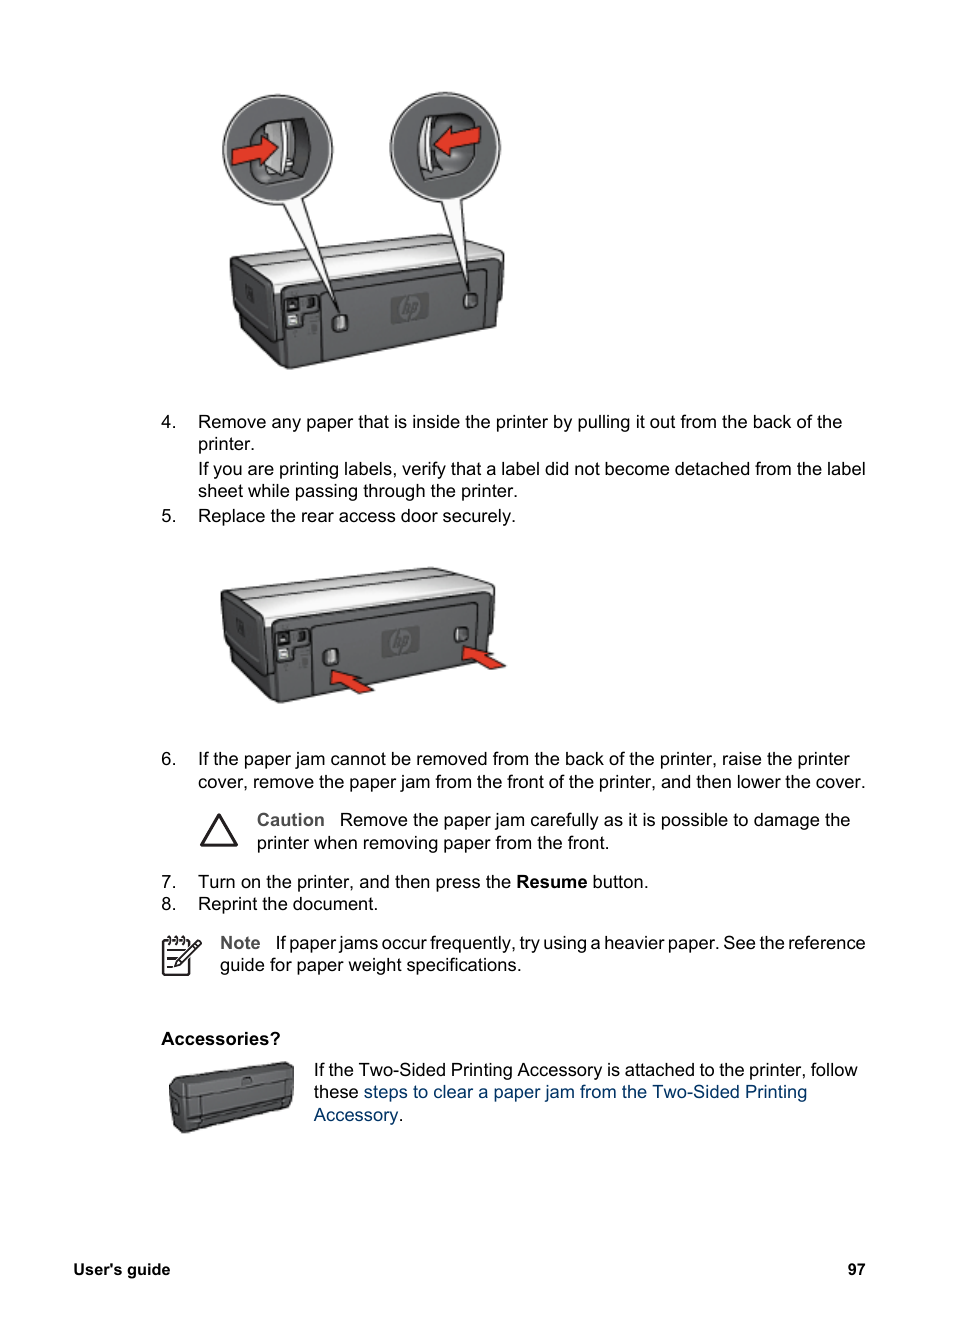 hp deskjet 6940 user manual page 99 150 also for deskjet 6943 rh manualsdir com HP 6940 Printer Troubleshooting HP 6940 Ink